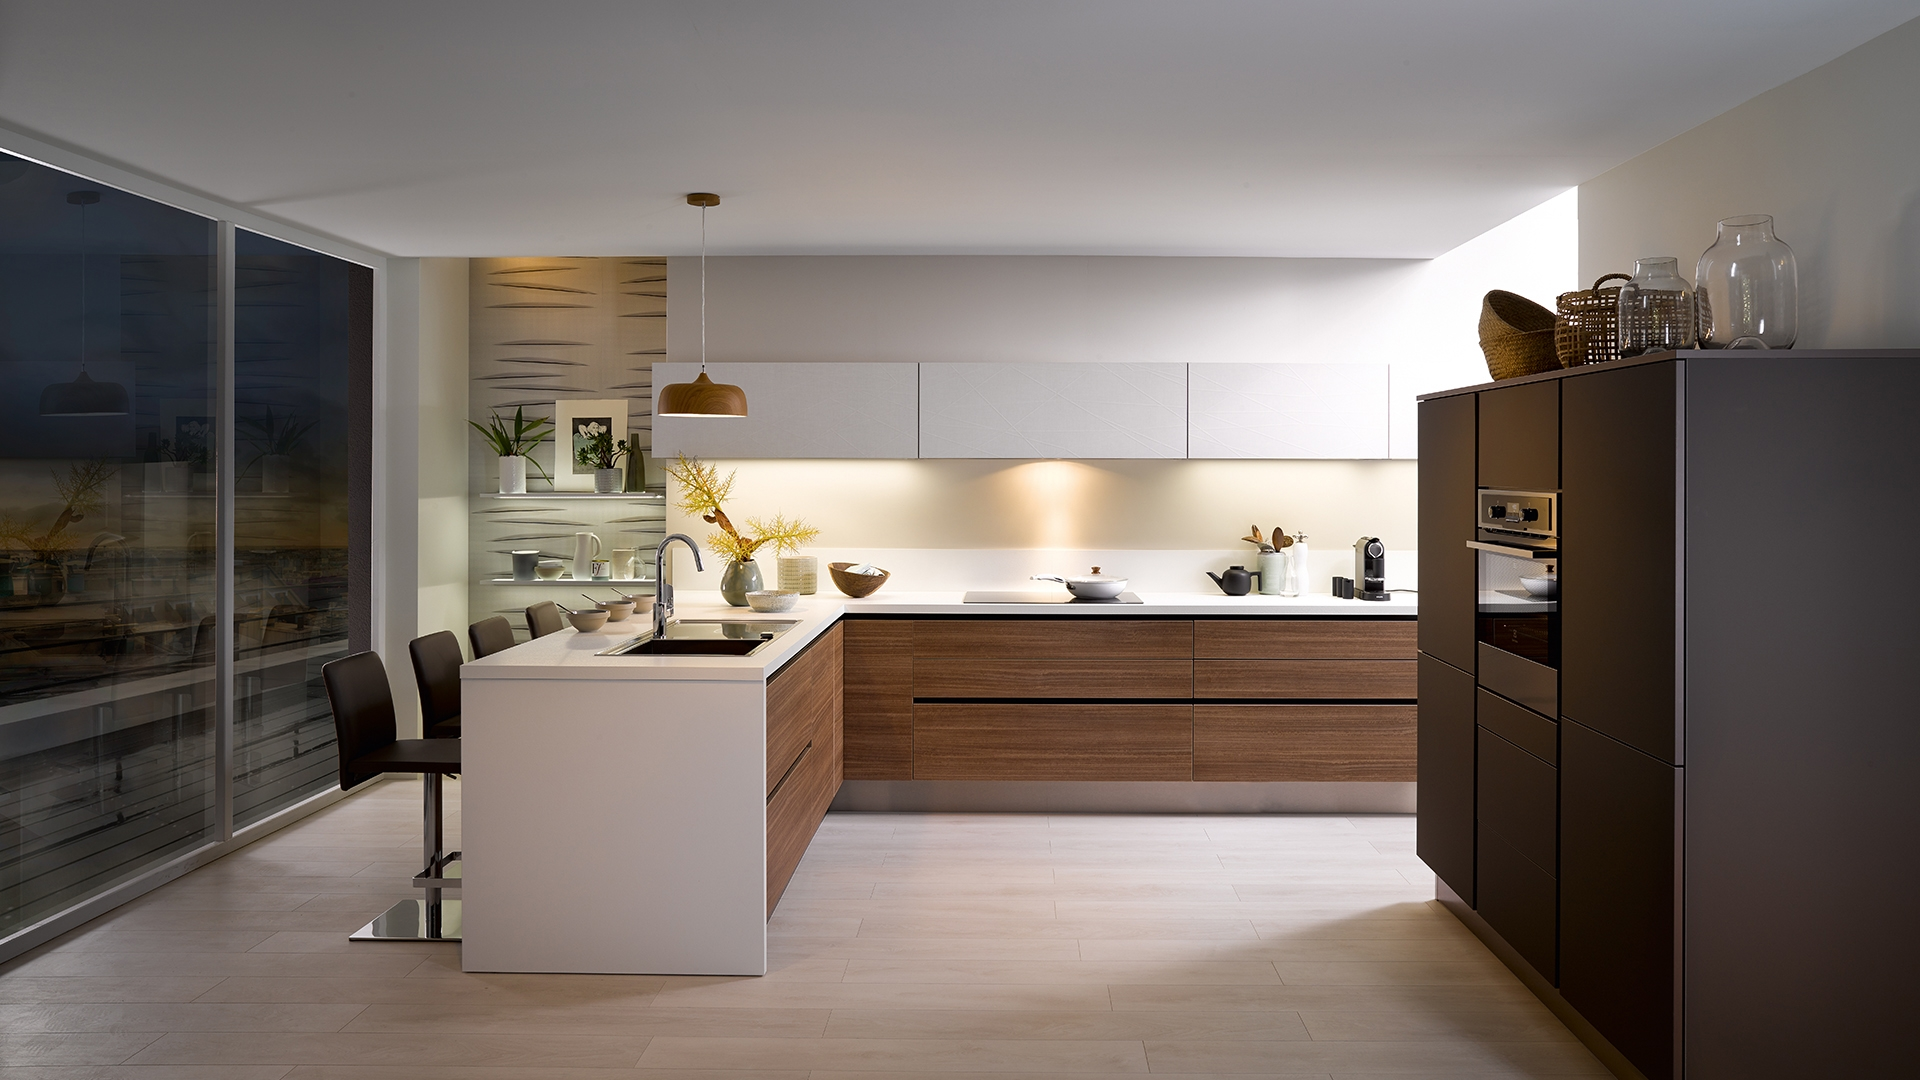 plan de travail cuisinella winoka livraison. Black Bedroom Furniture Sets. Home Design Ideas